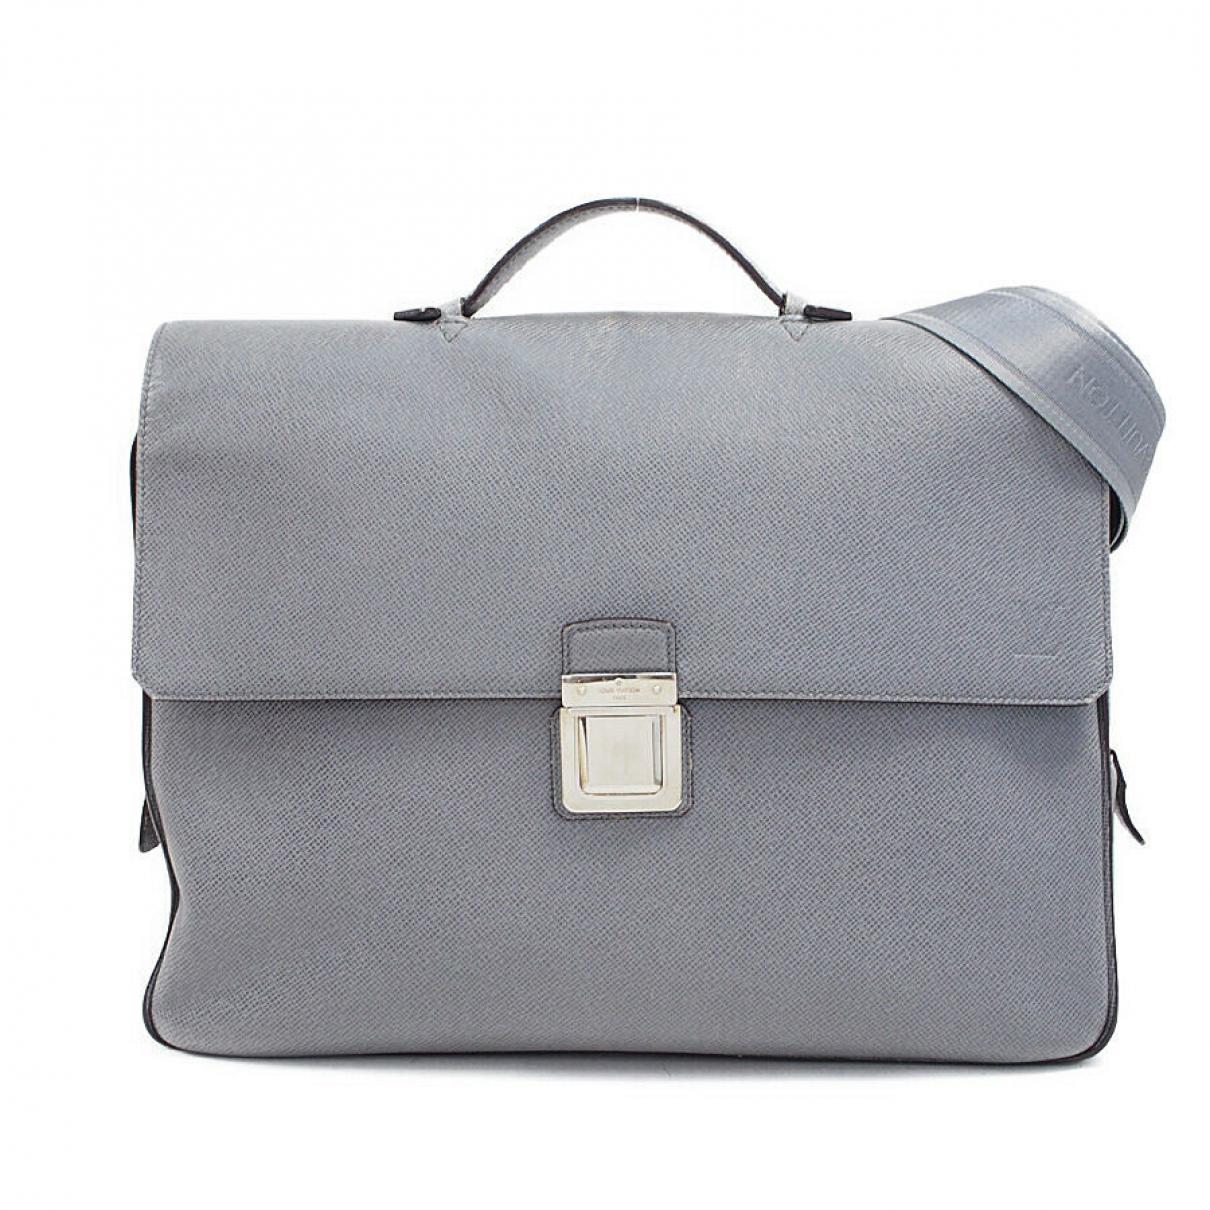 Louis Vuitton N Leather Travel bag for Women N